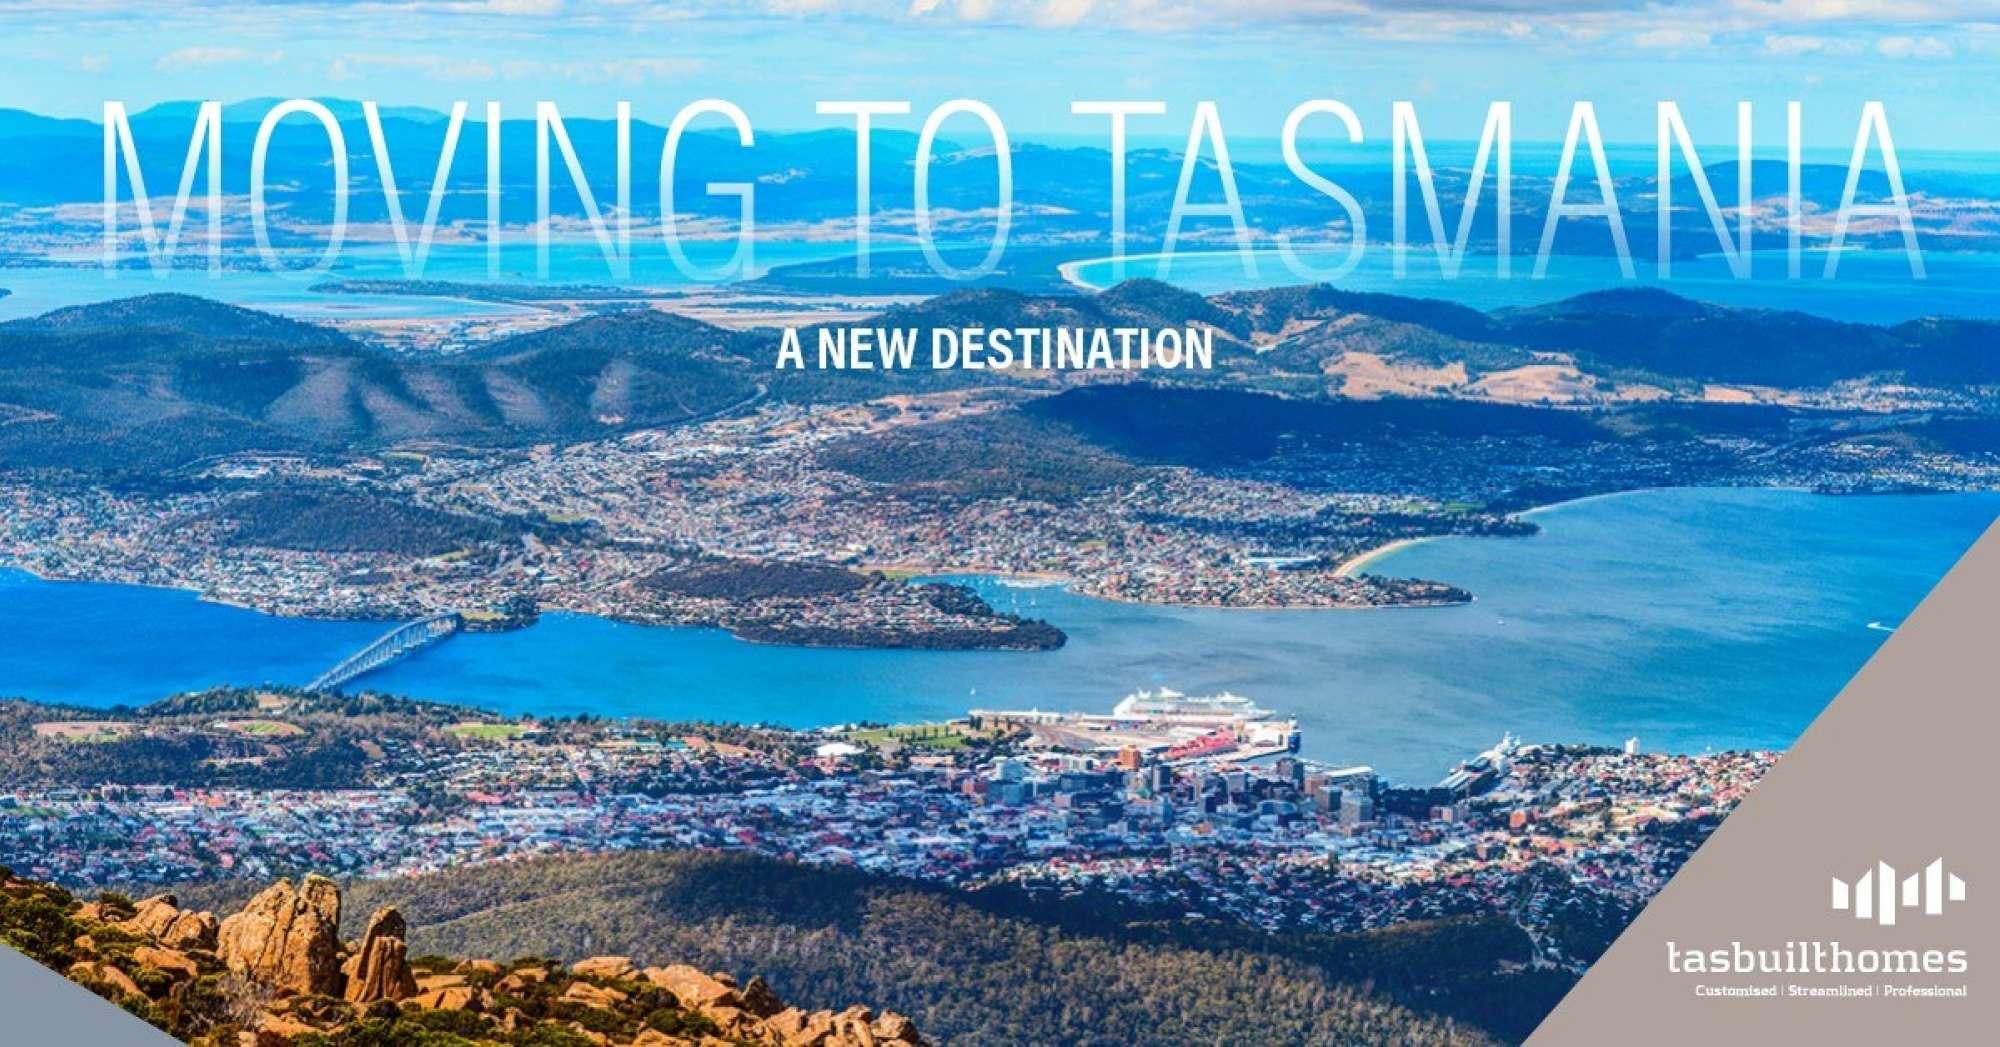 Moving-to-tasmania